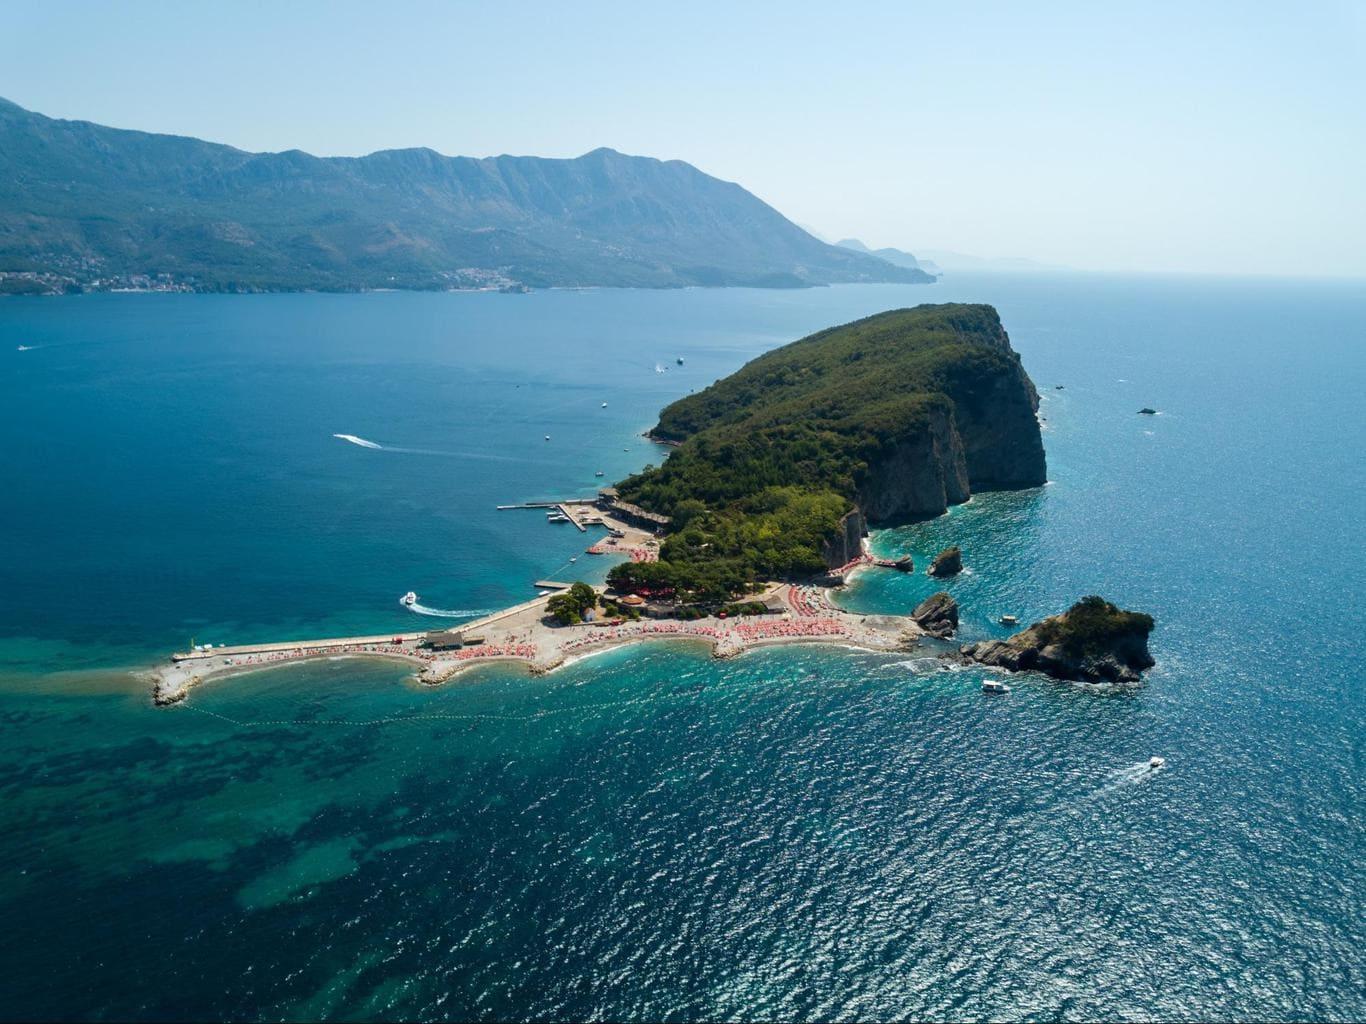 Saint Nikola Island